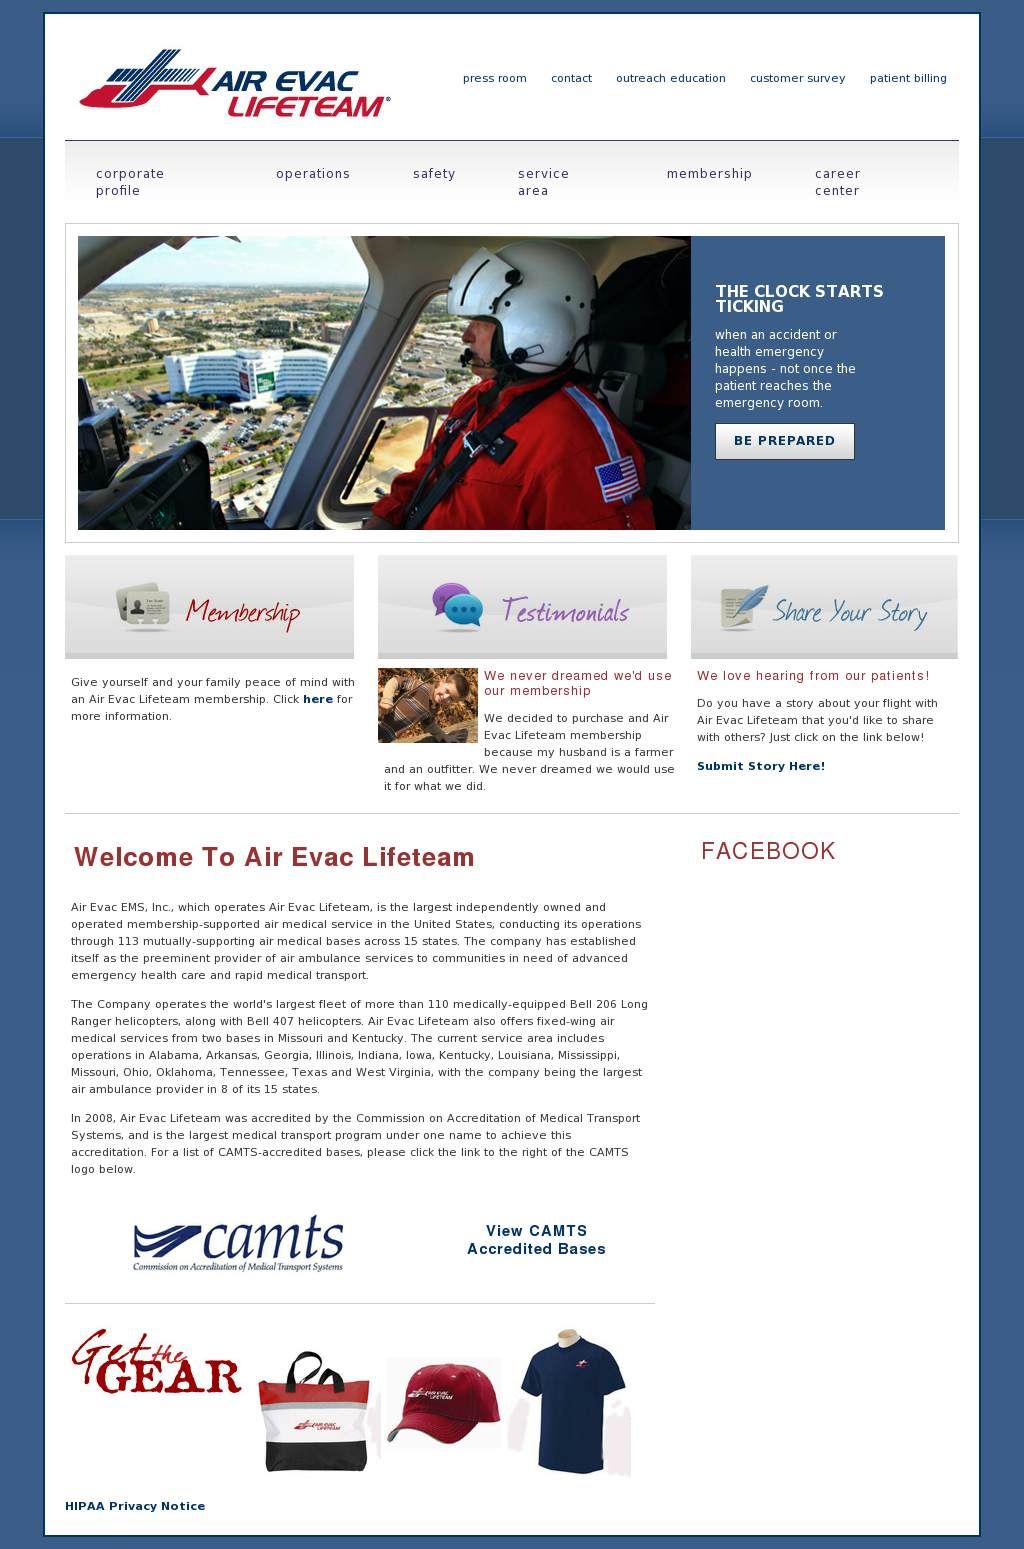 Air Evac Lifeteam Competitors, Revenue and Employees - Owler